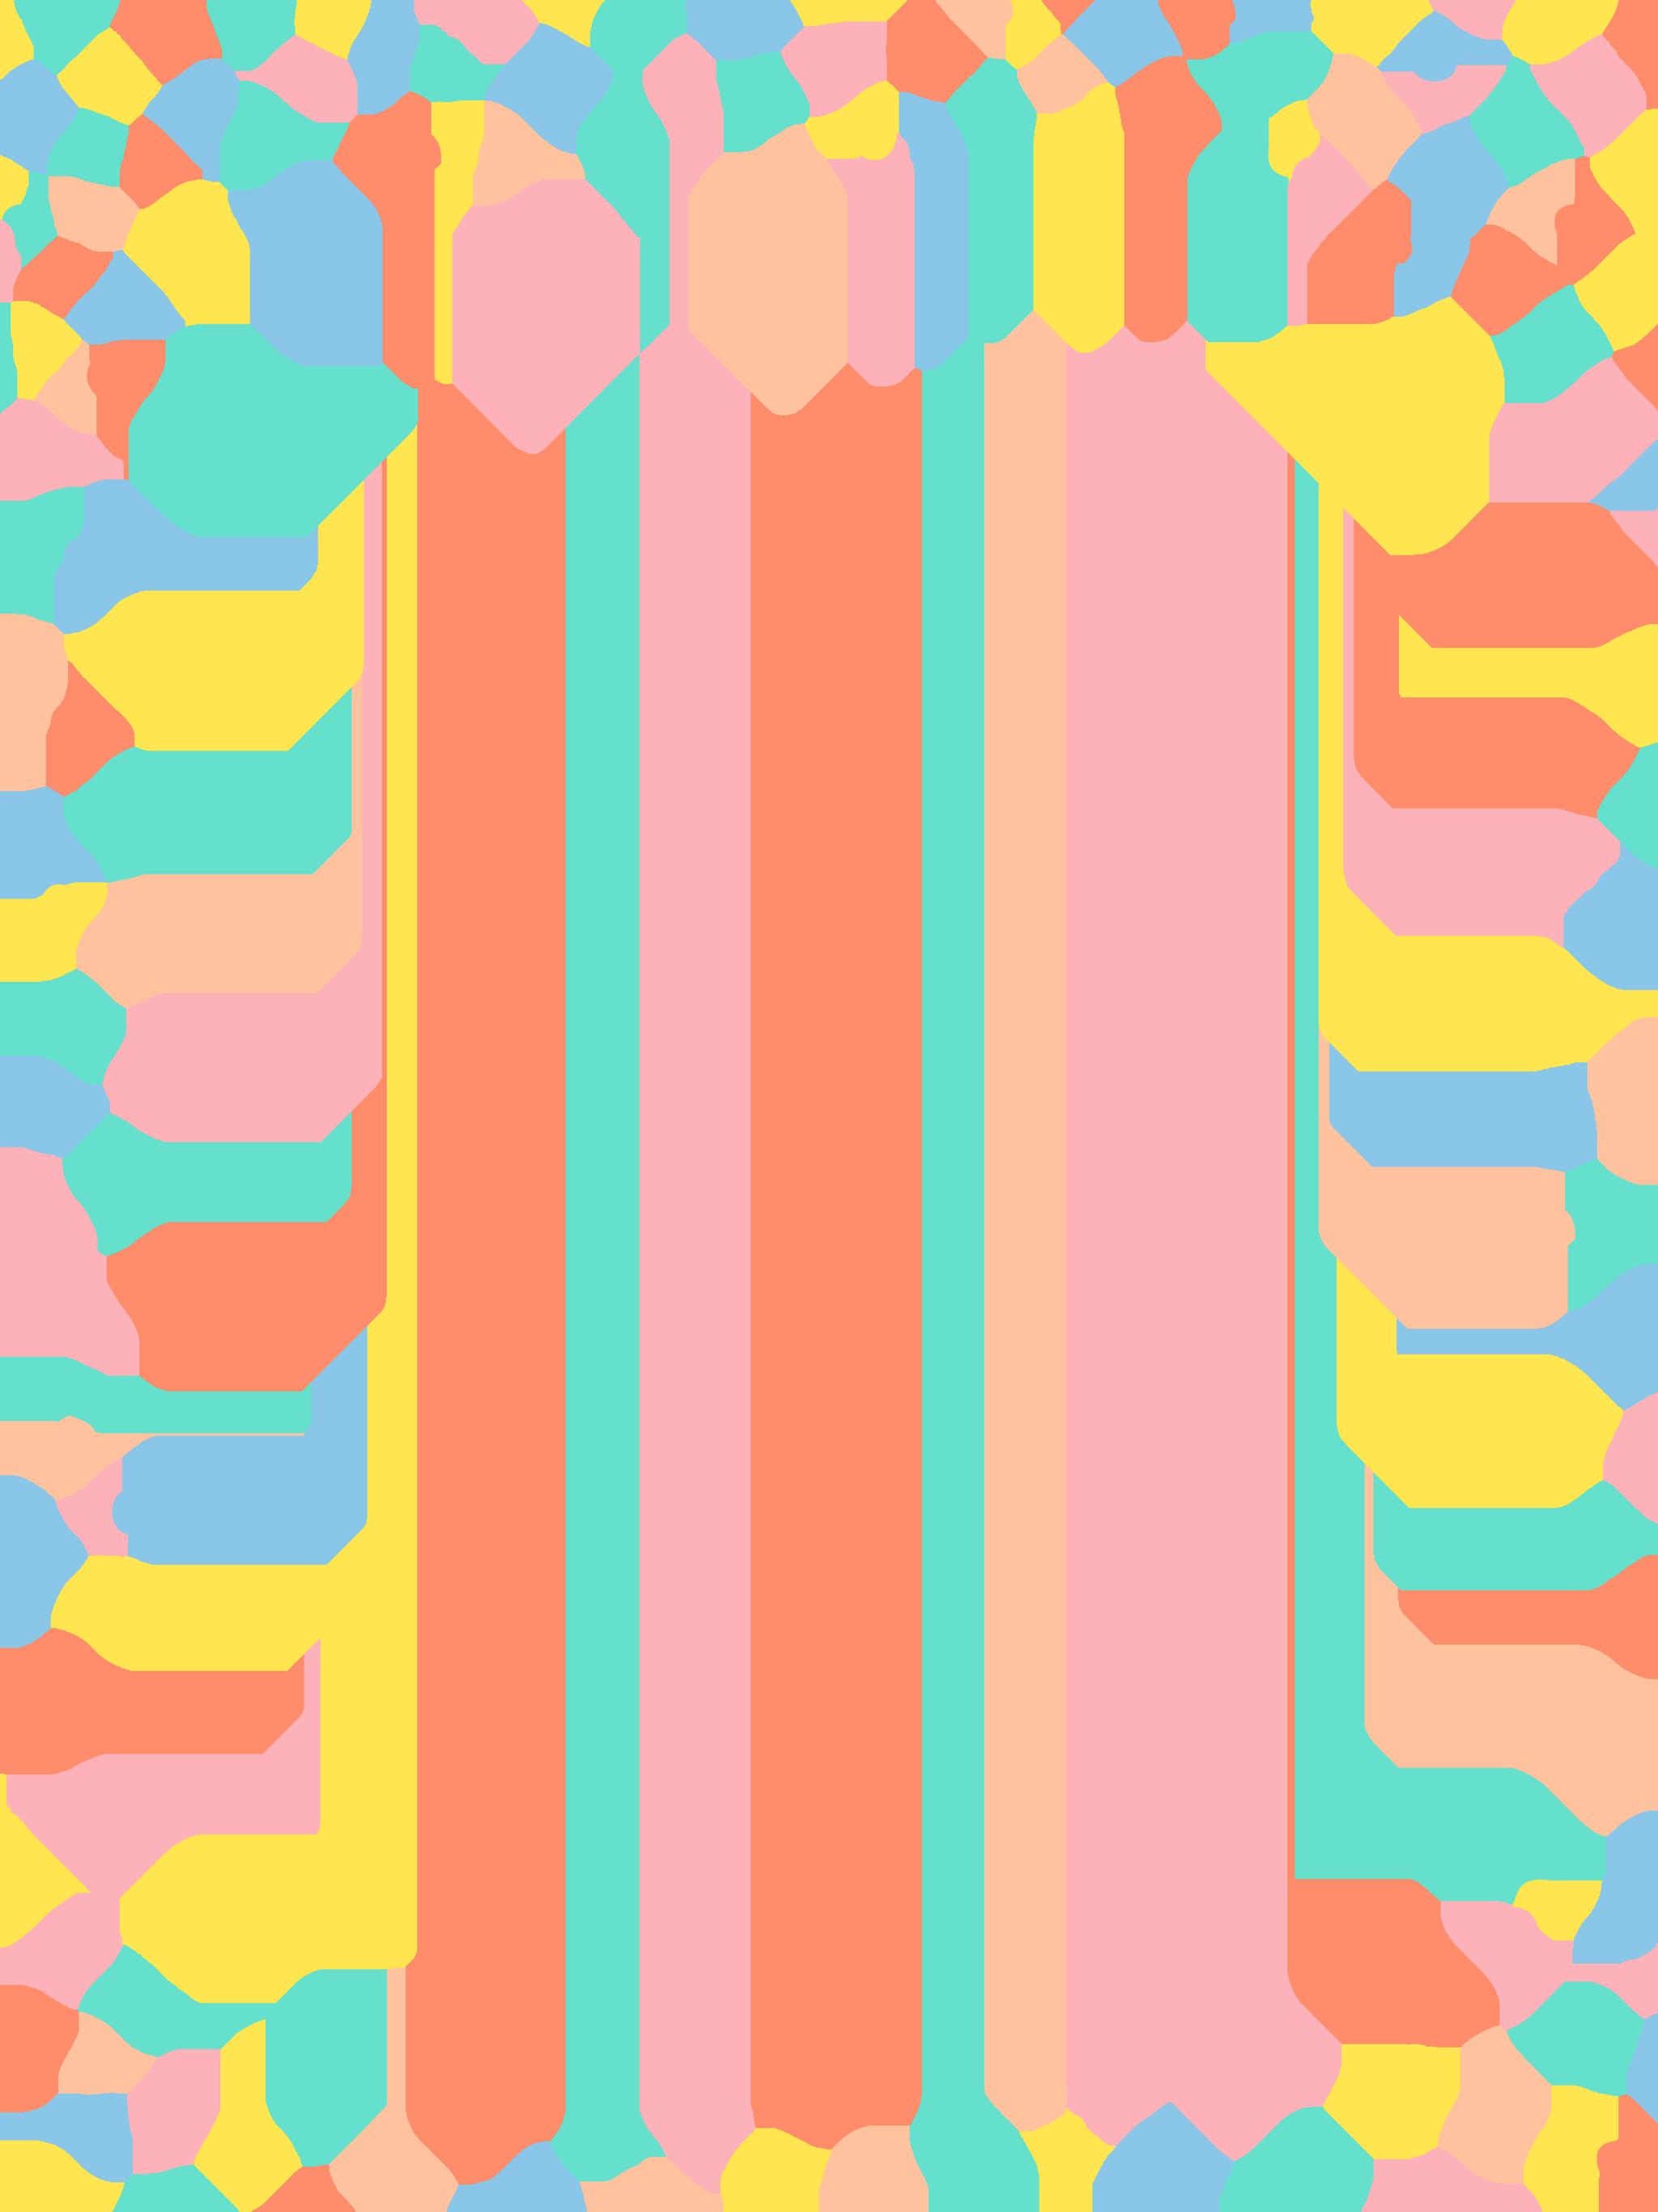 Ipad Vertical_2048x2732_Confetti.png